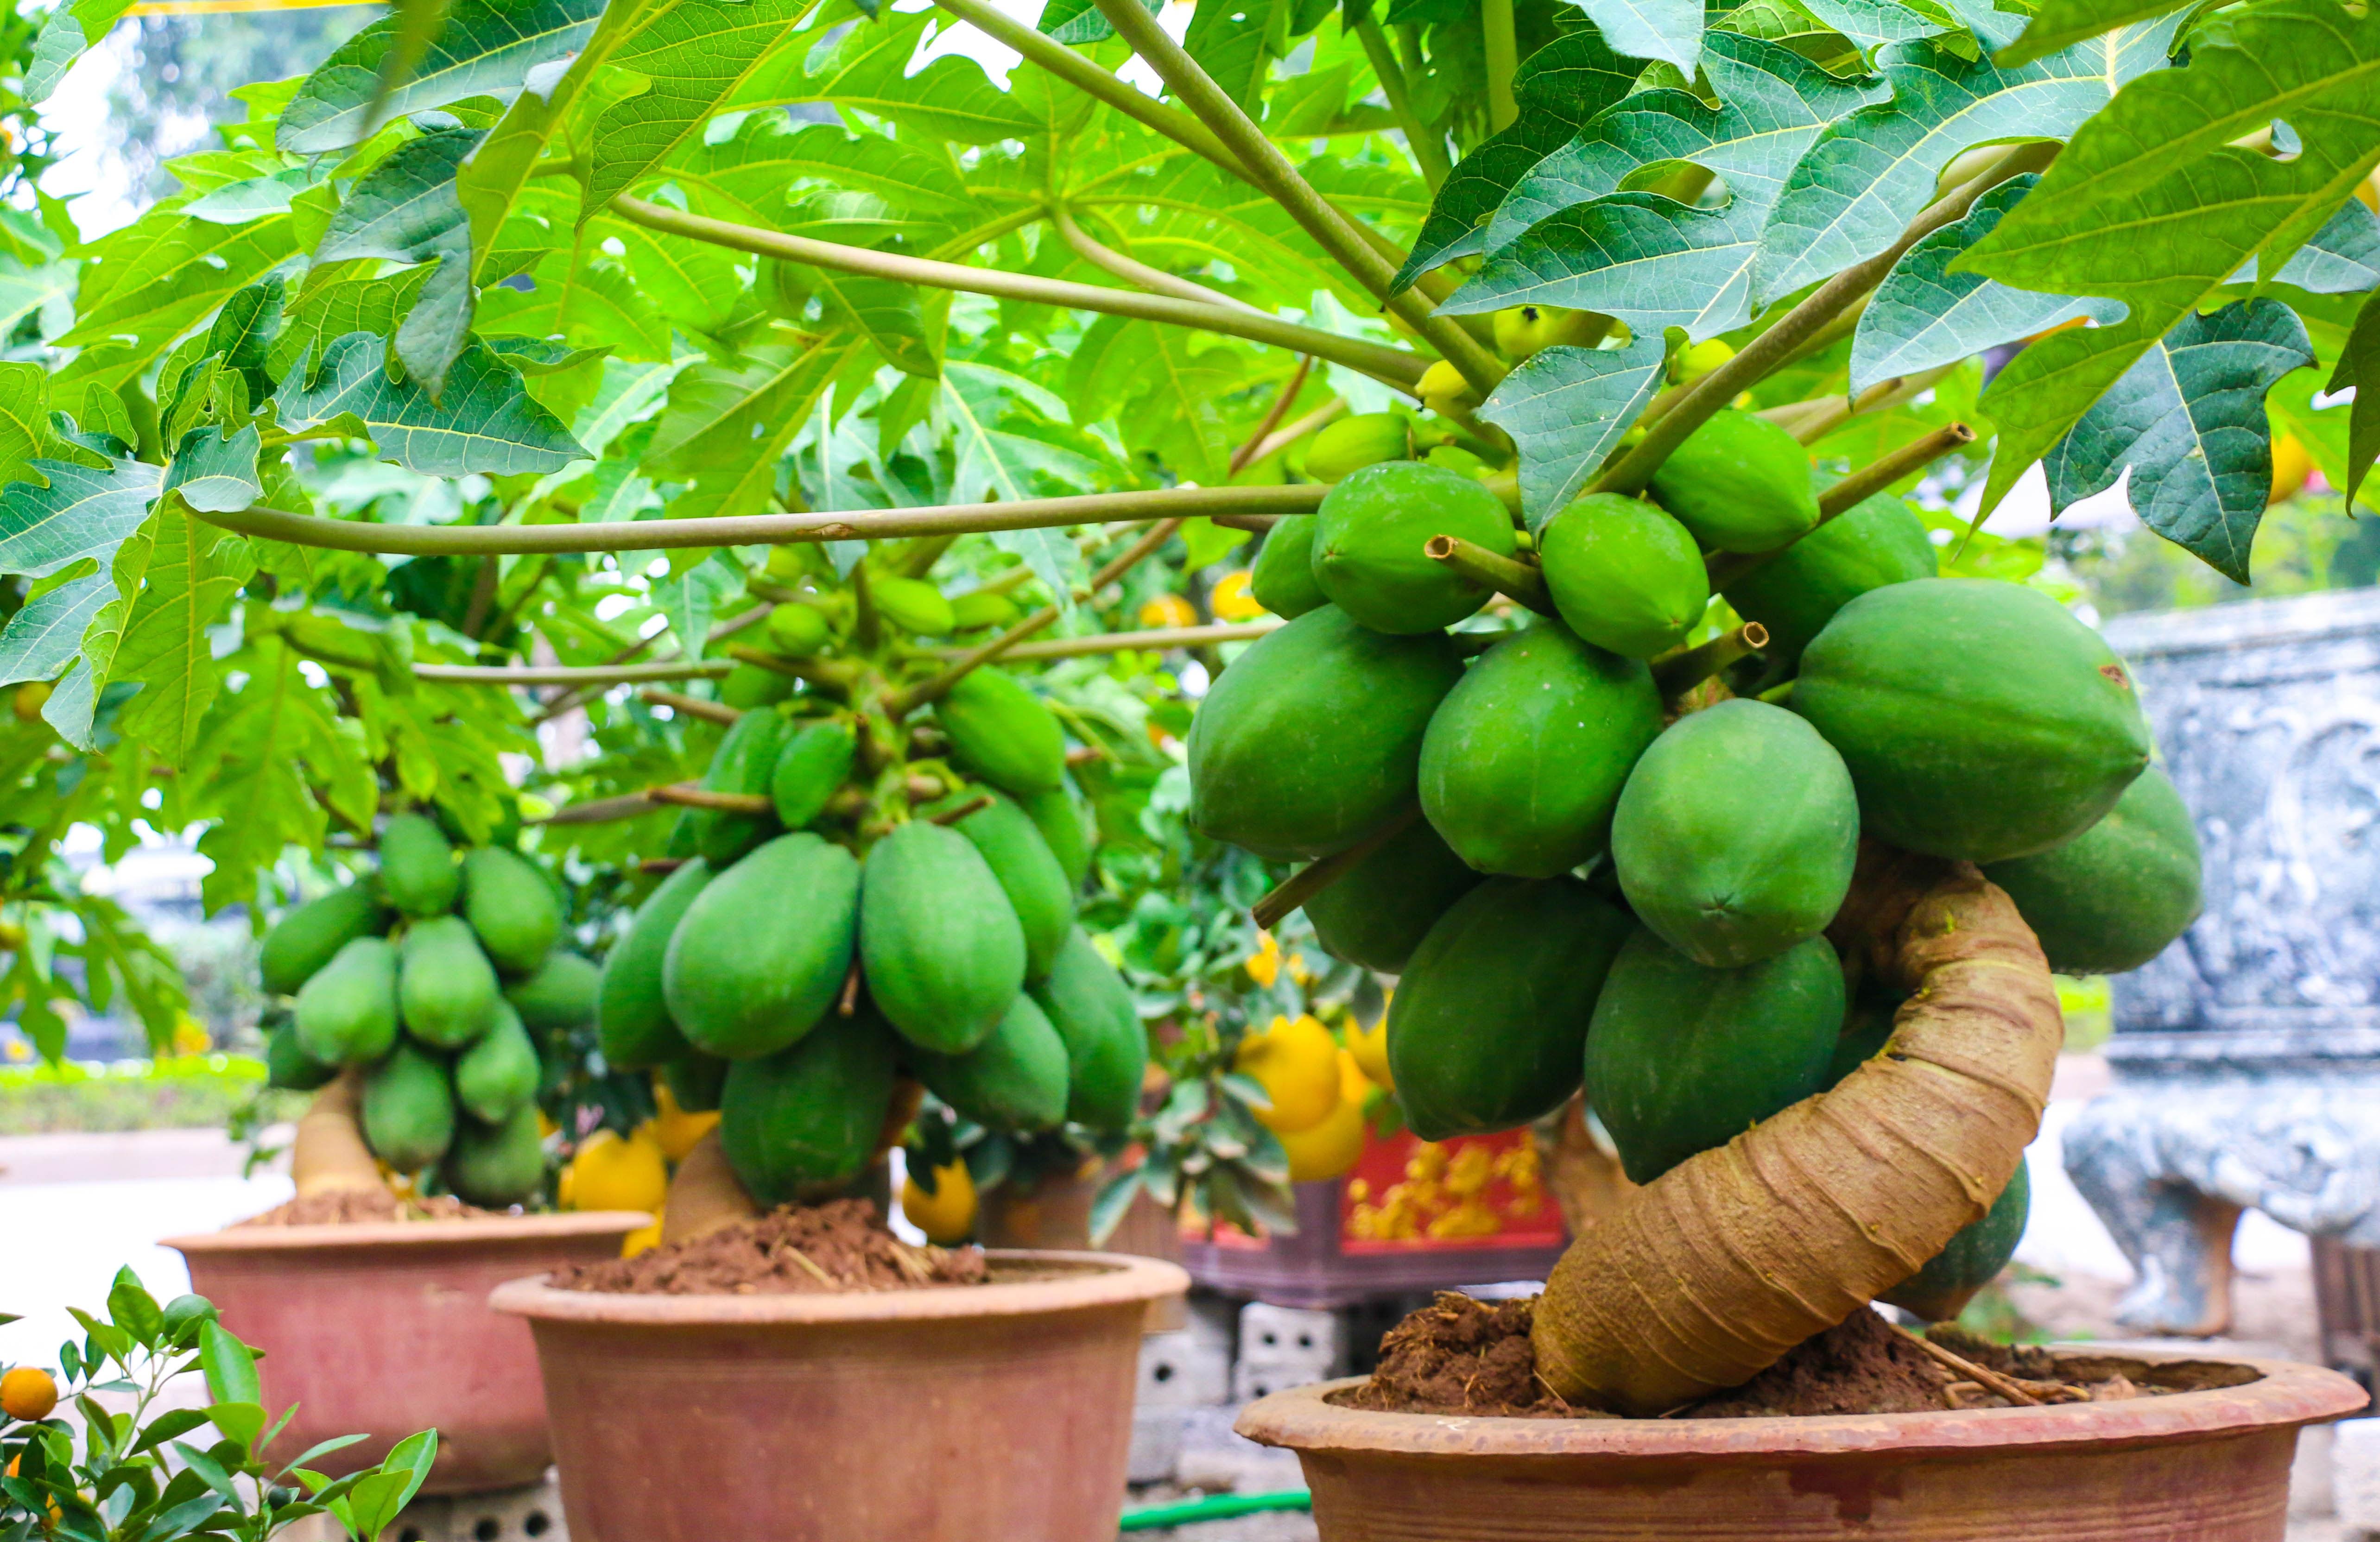 du du bonsai cay canh bac trieu hut khach dip tet nguyen dan 2019